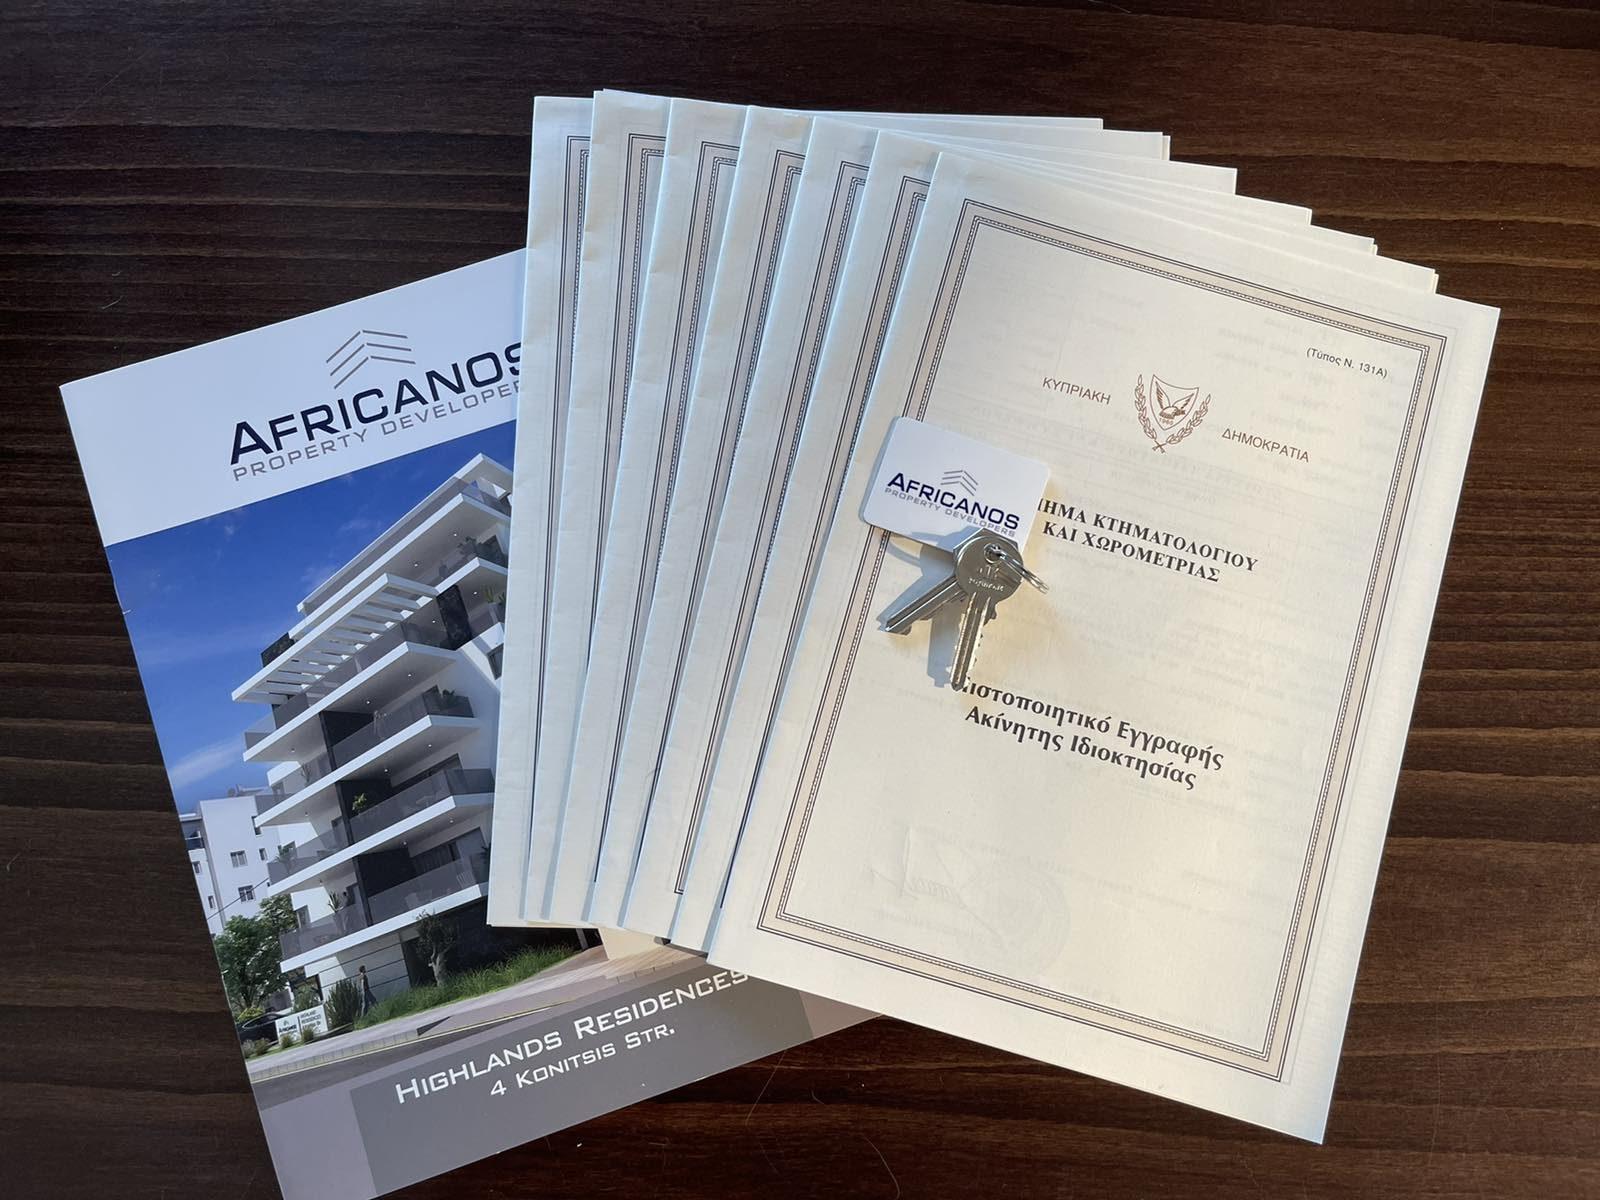 Africanos Property Developers Ltd: Έκδοση τίτλων ιδιοκτησίας